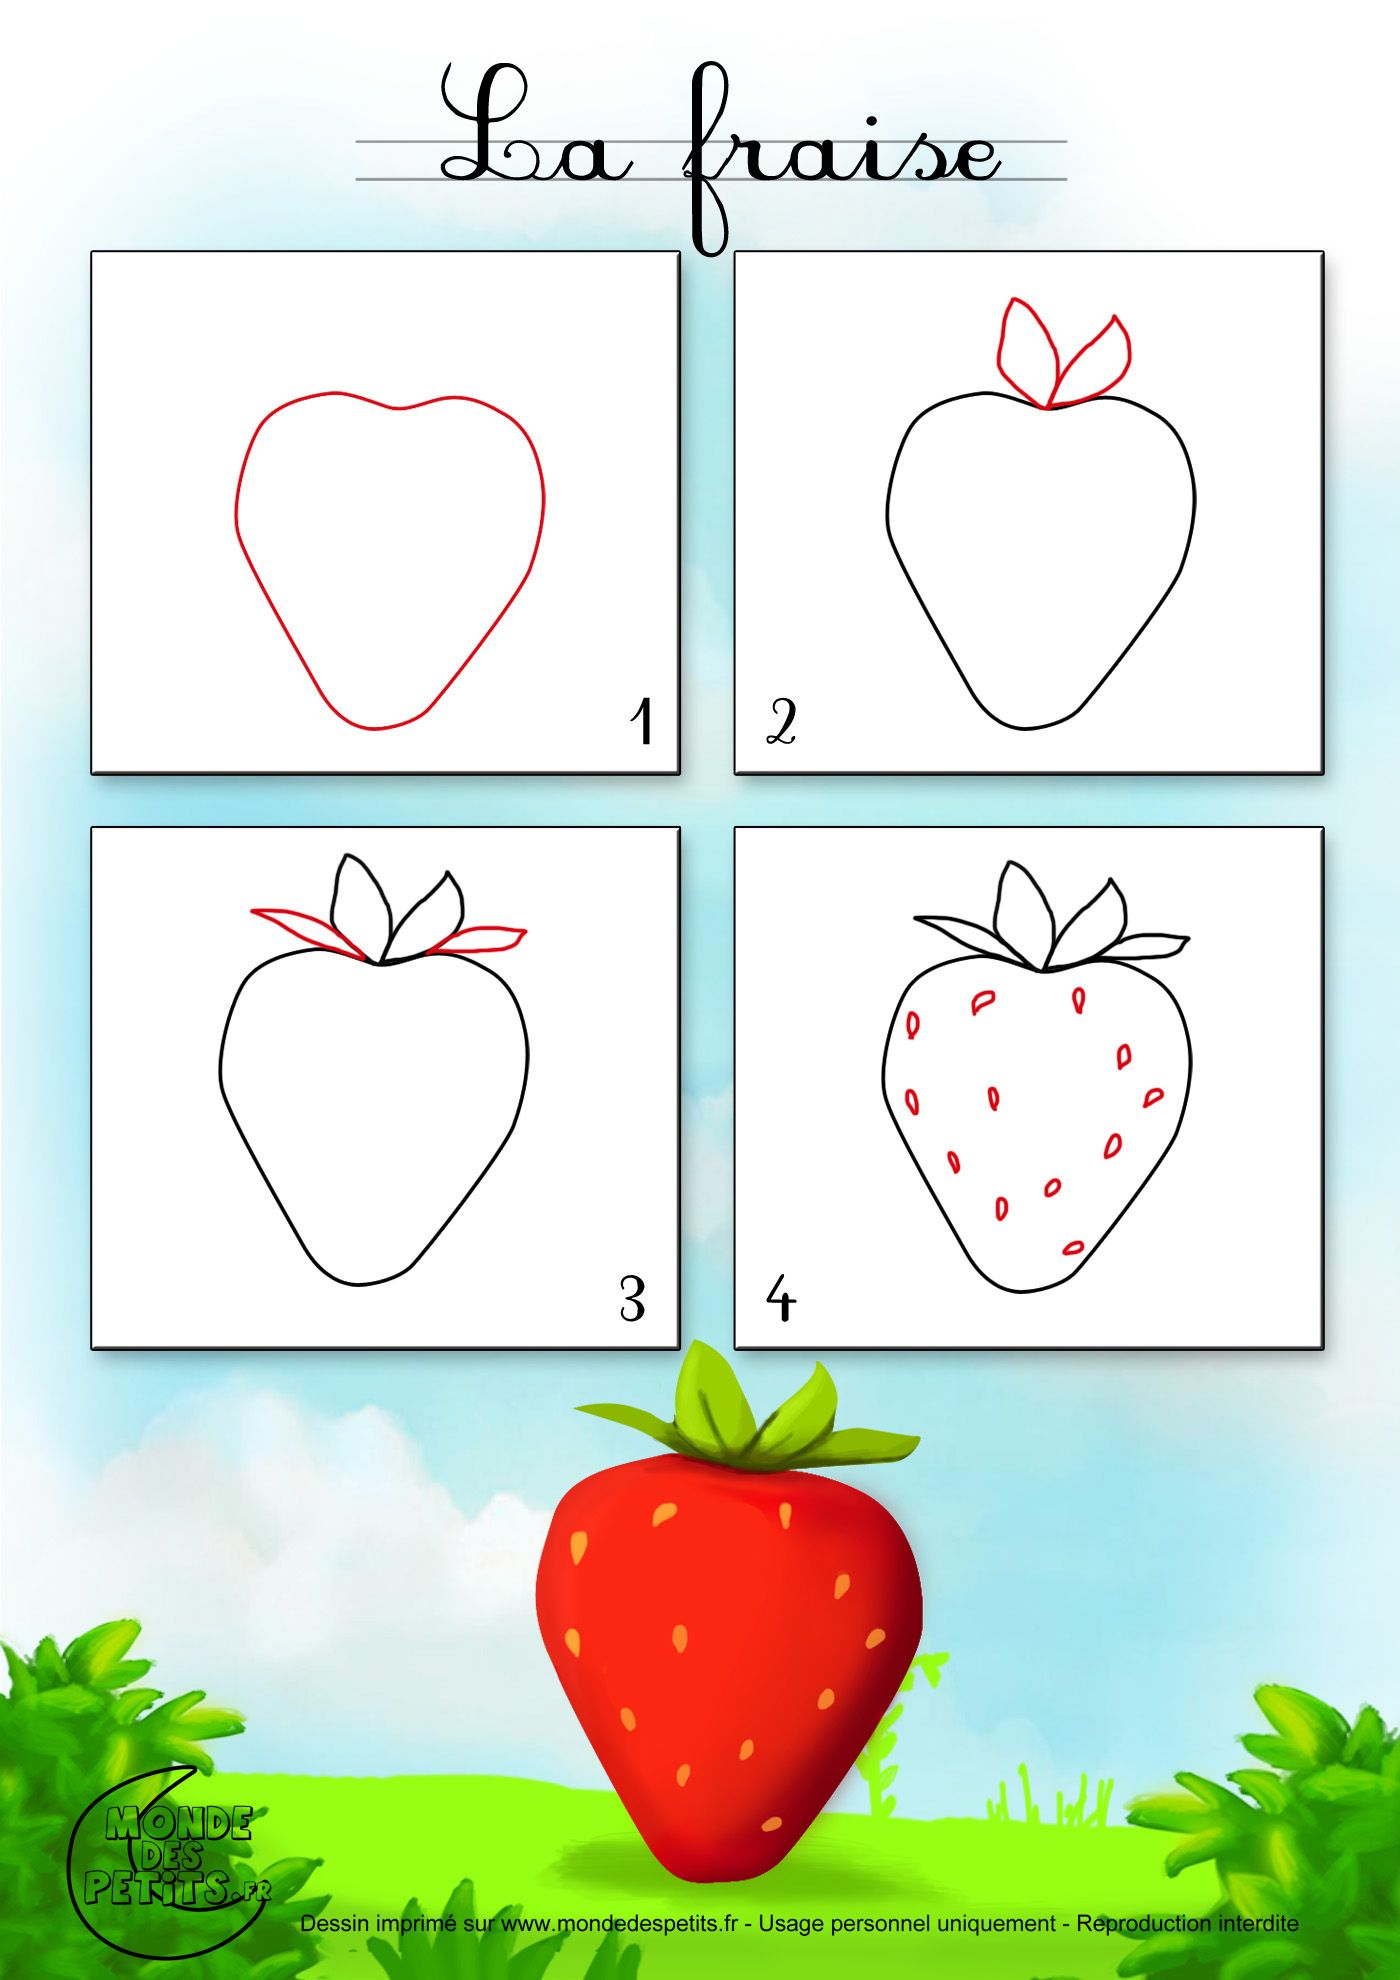 2015 07 et jordb r bricolage pinterest - Dessiner un fruit ...